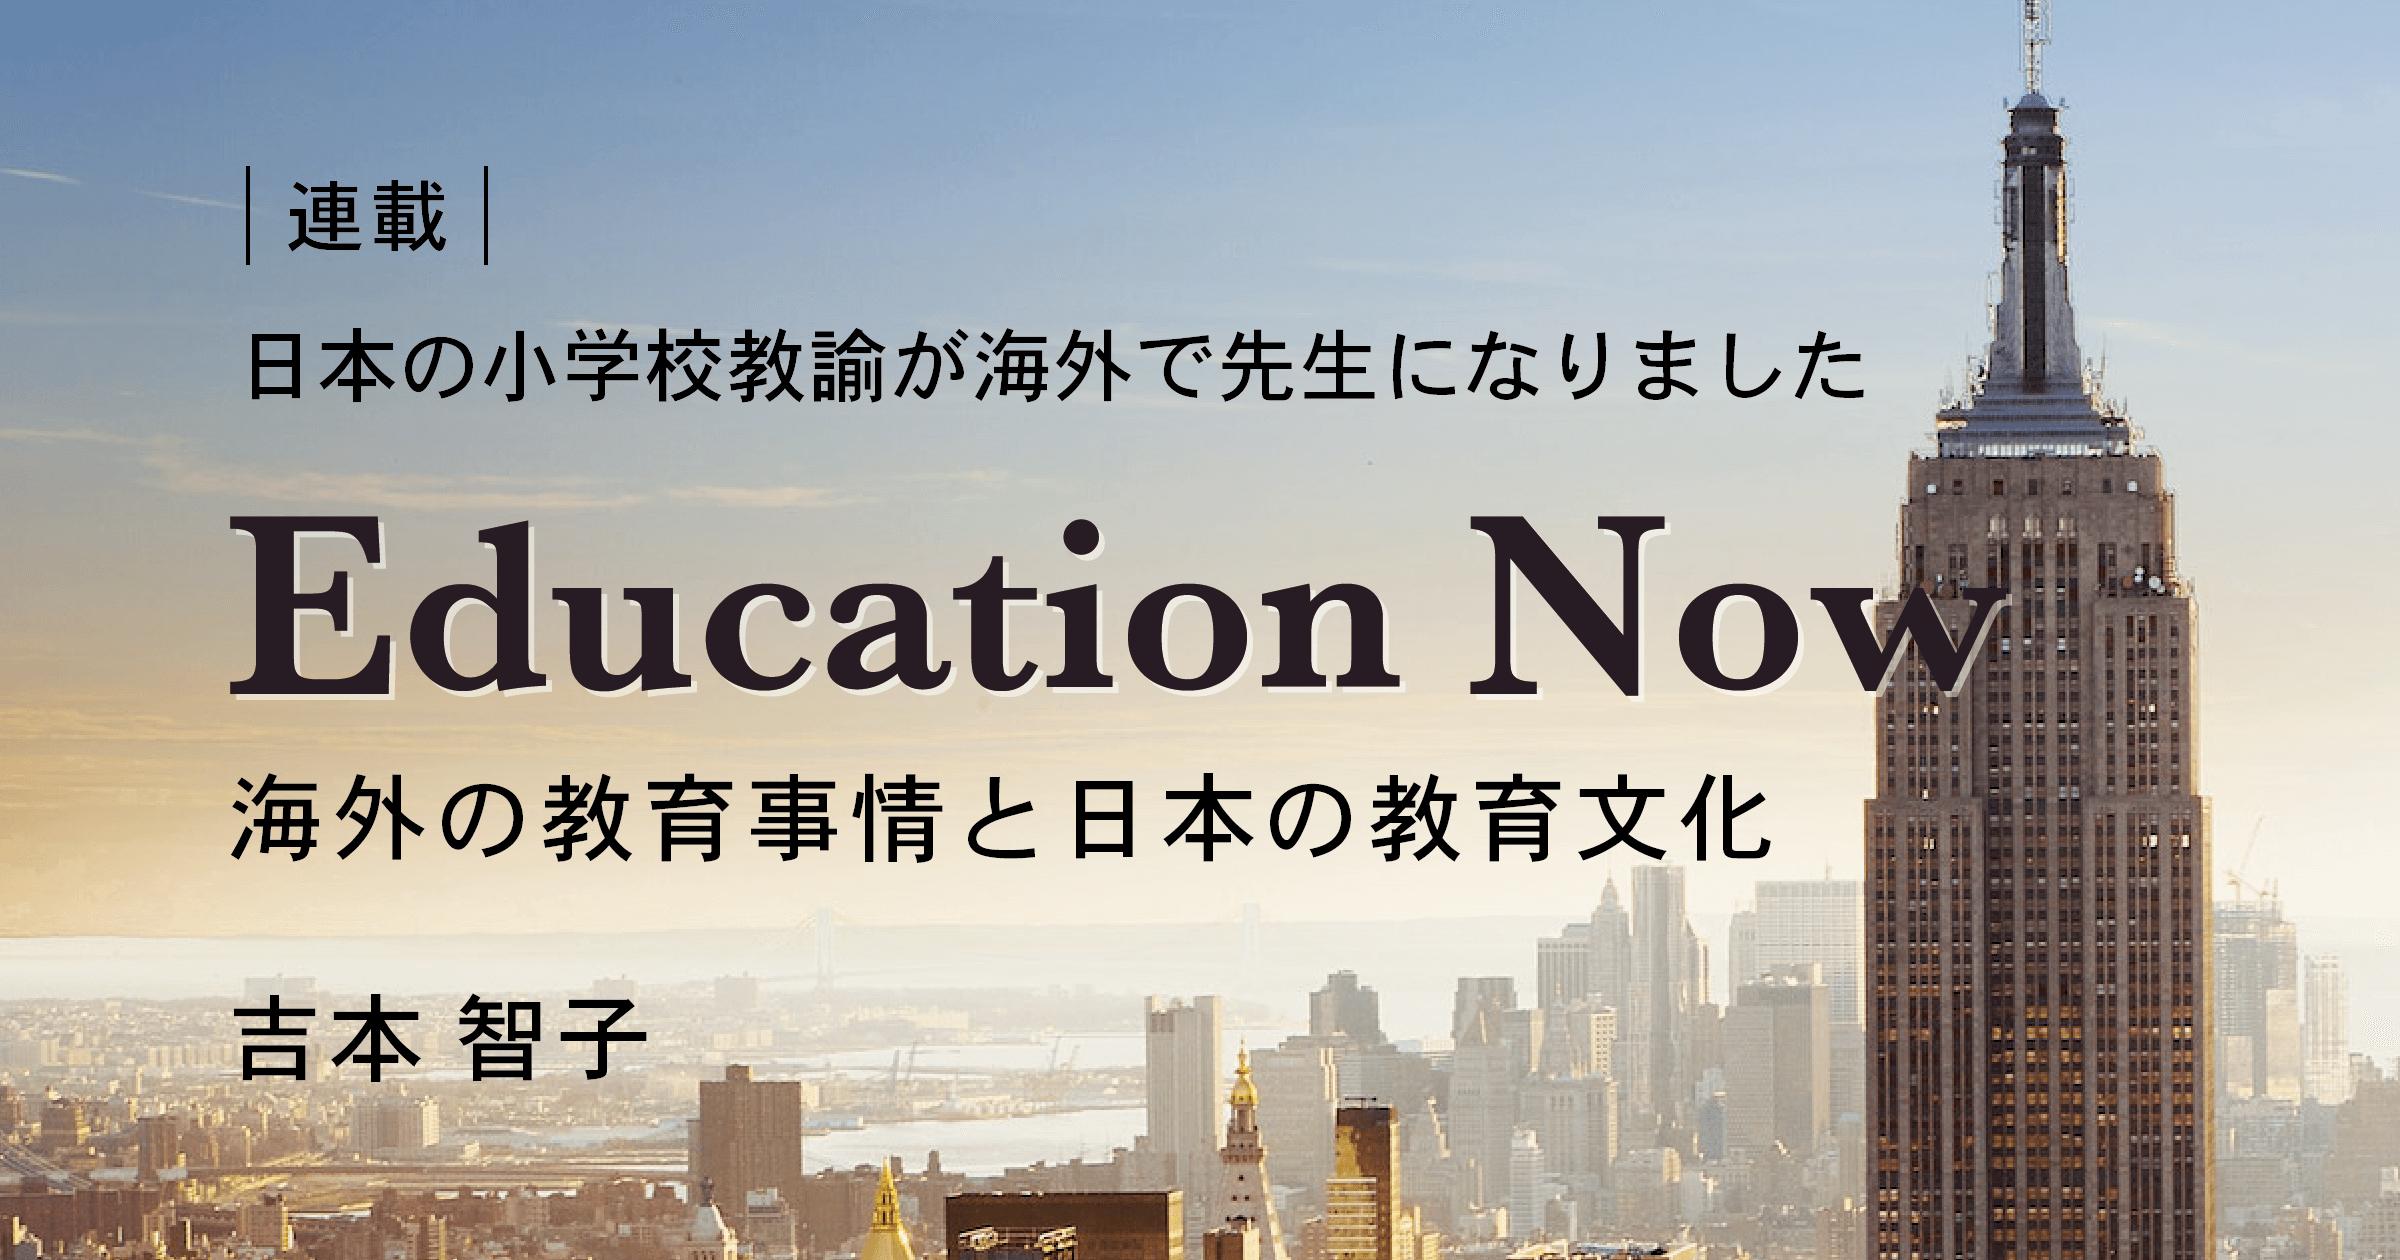 【Education Now 第1回】こんなに違う!? 海外の学習事情